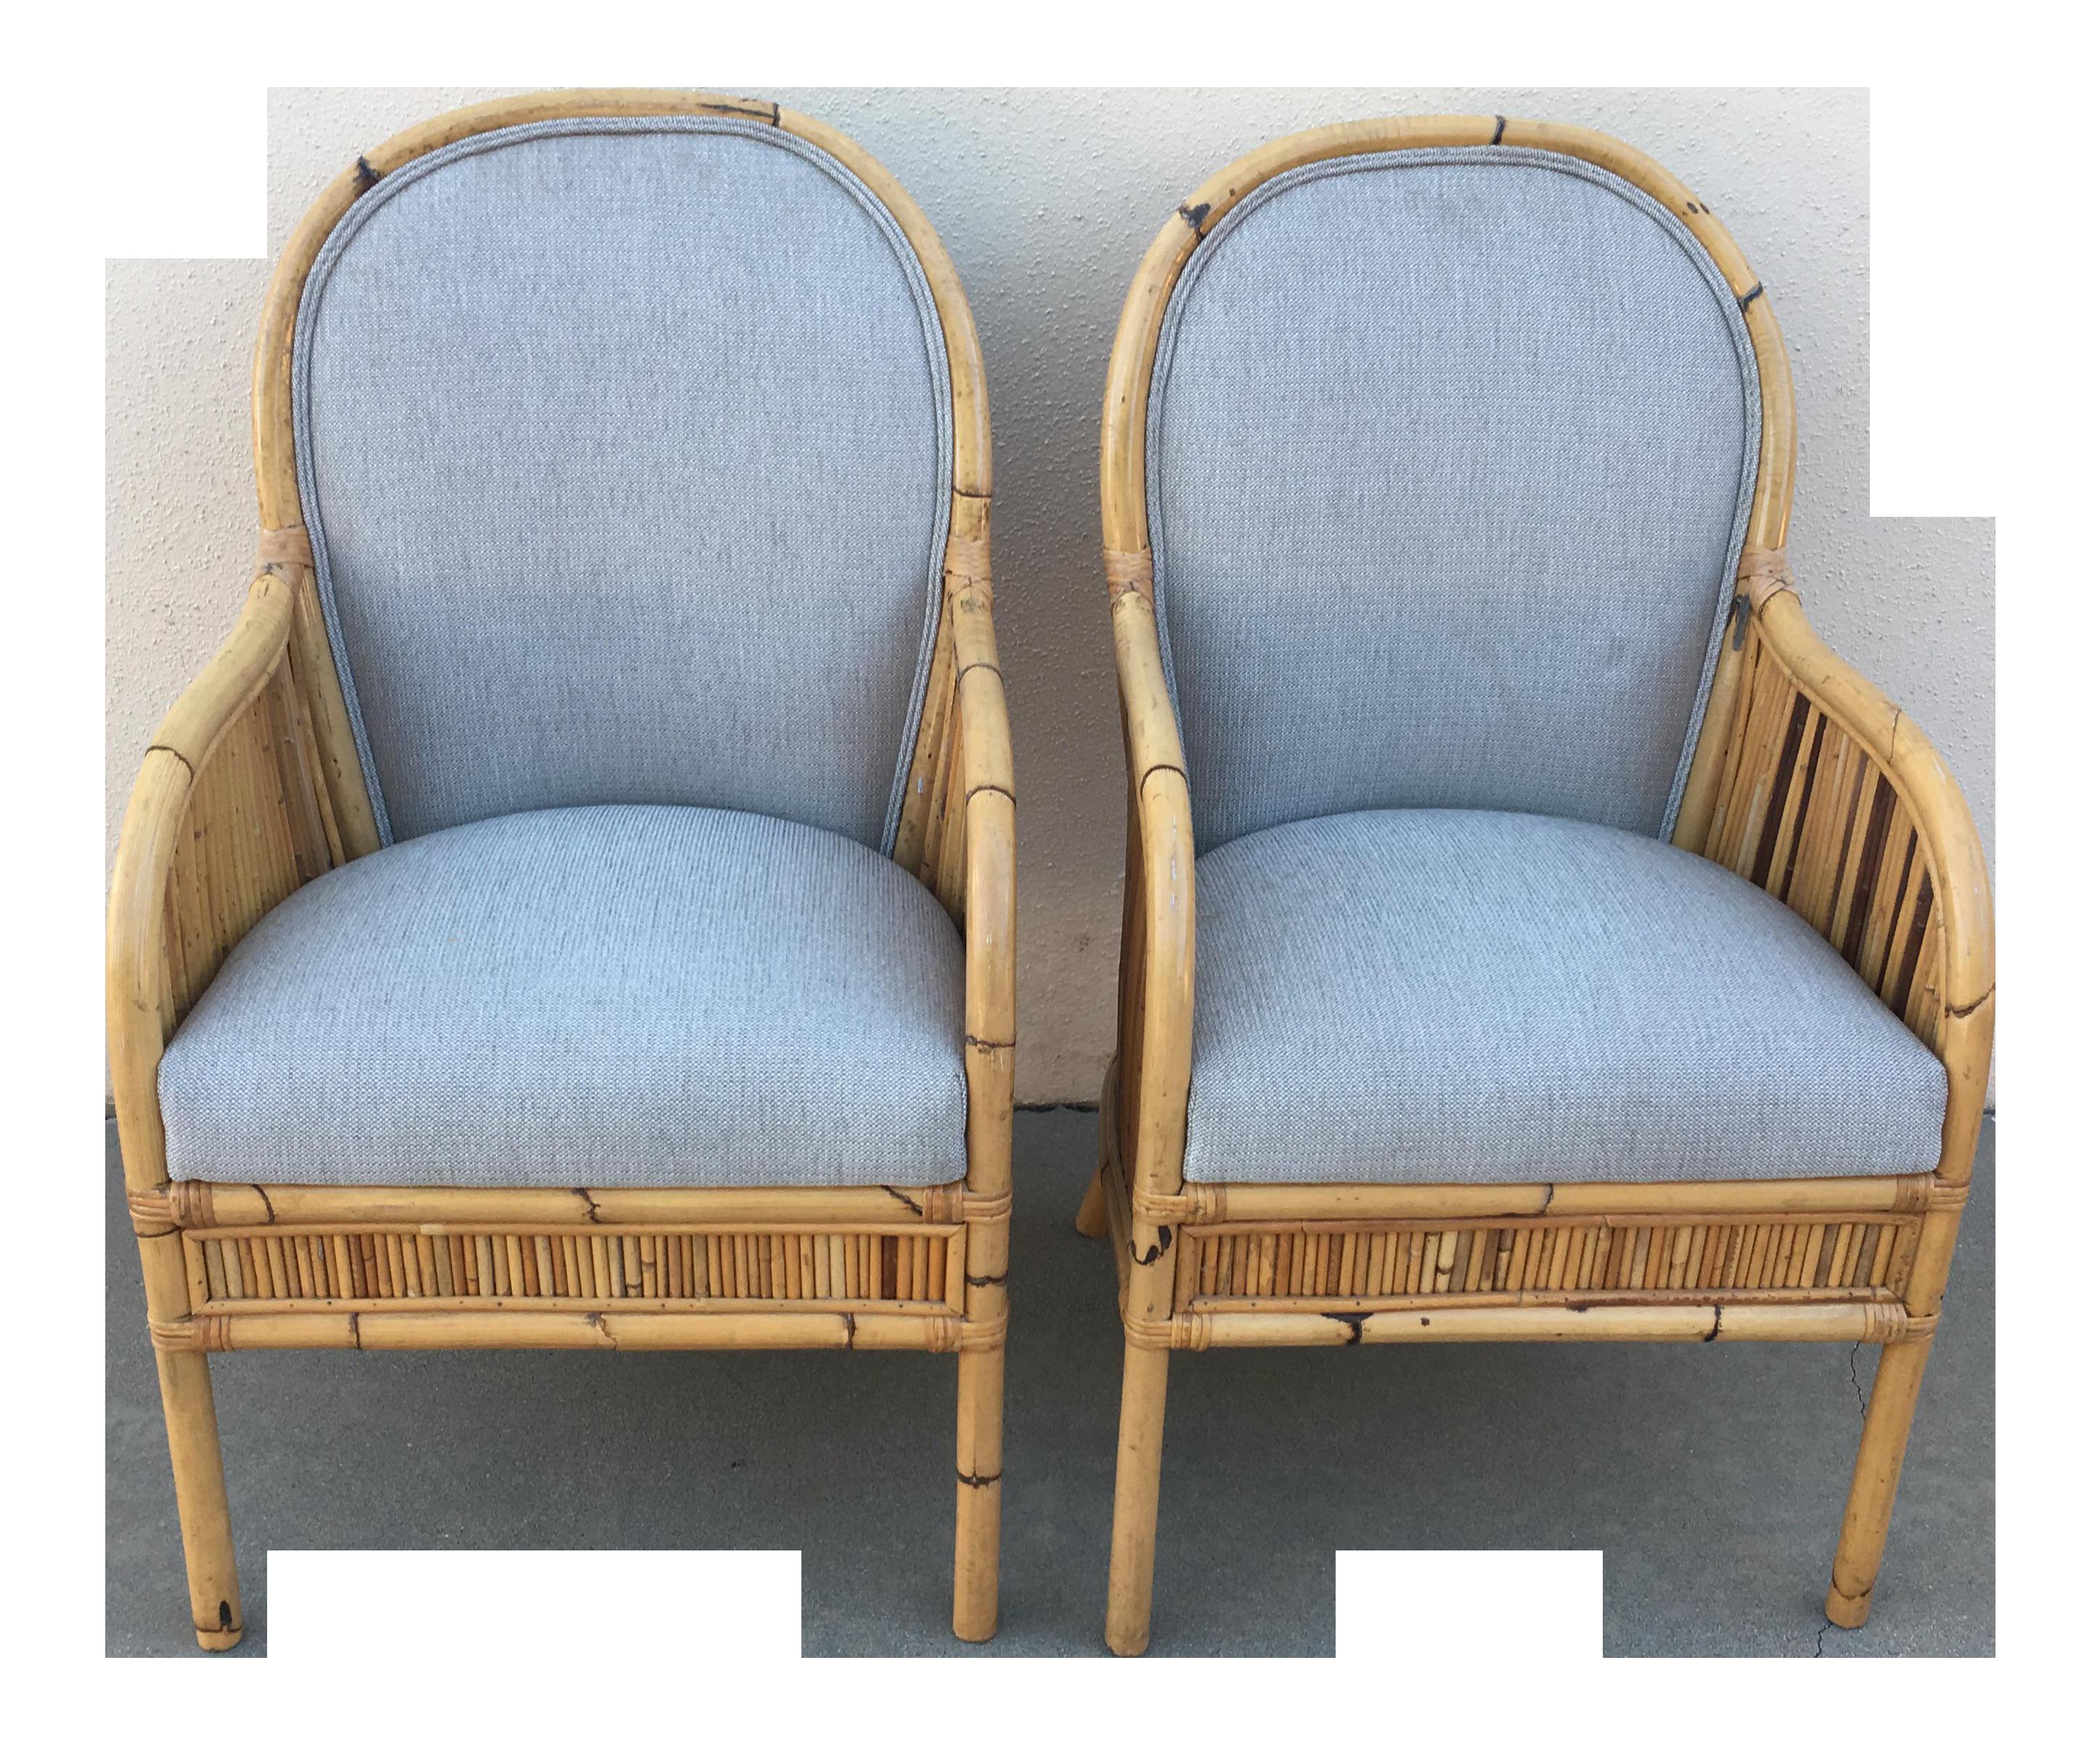 Boho Henry Olko Bamboo Arm Chairs A Pair